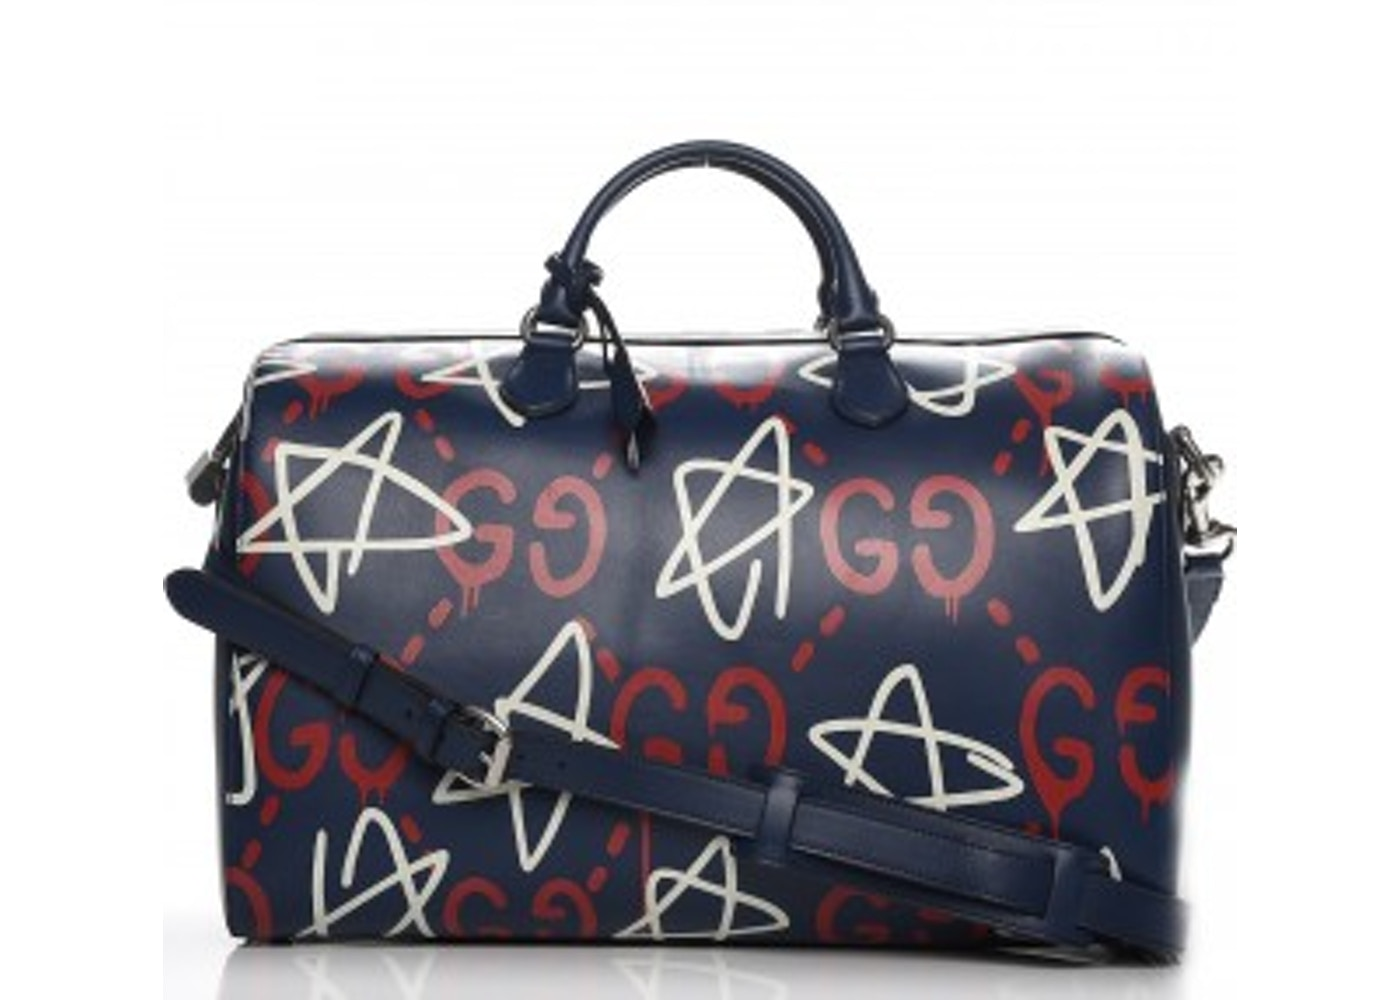 Gucci GucciGhost Duffle Bag GG Graffiti Print Overlay Navy Blue Red White 75e8c2cc131